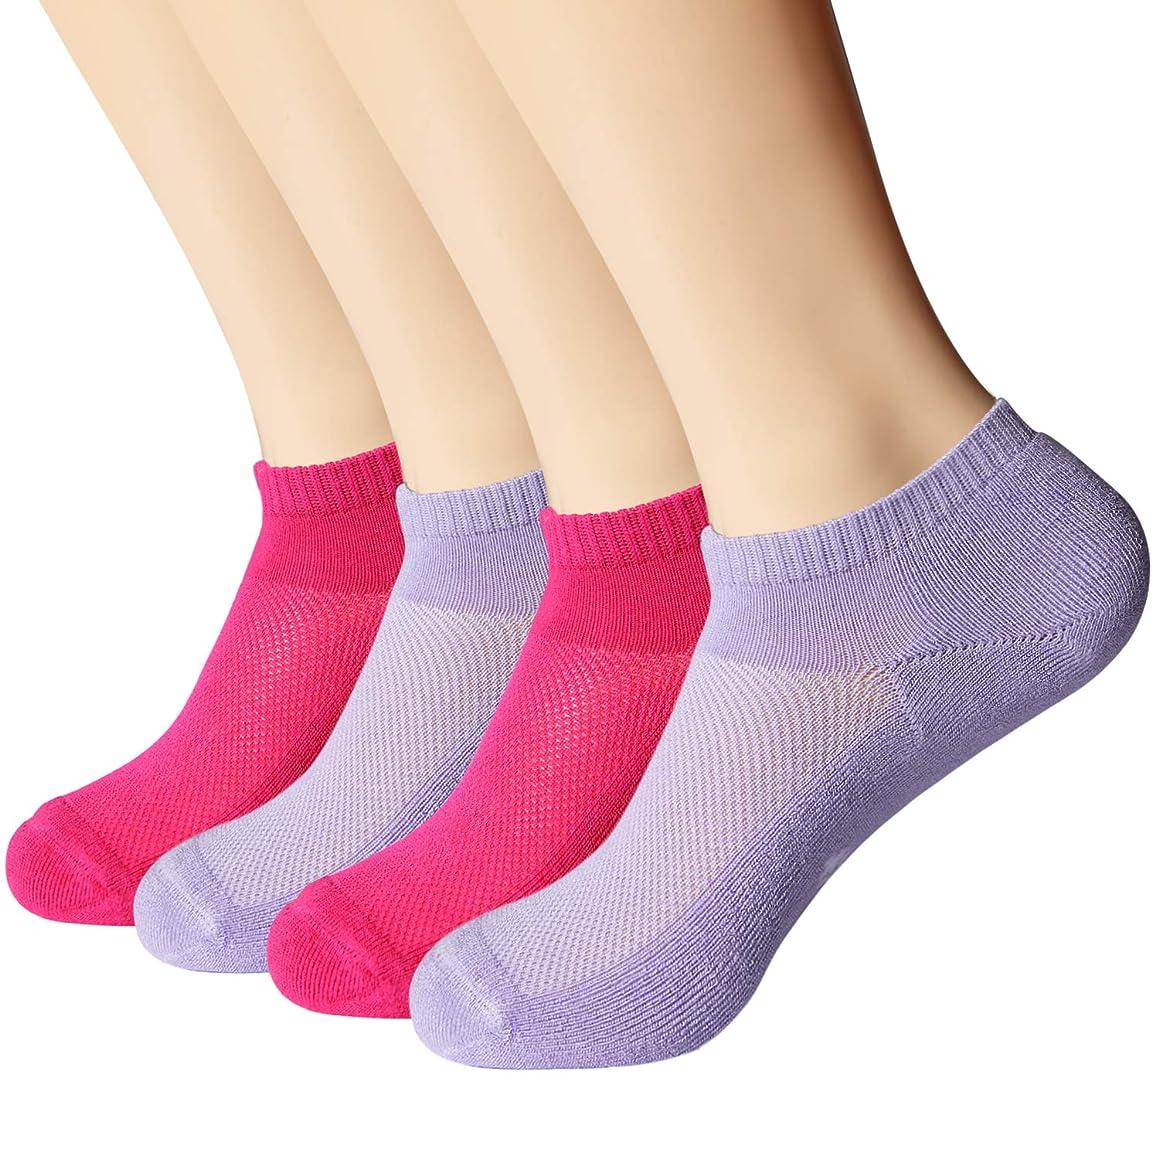 +MD 4 Pack Womens Bamboo Odor Control Low Cut Socks Soft Cushioned Athletic Socks